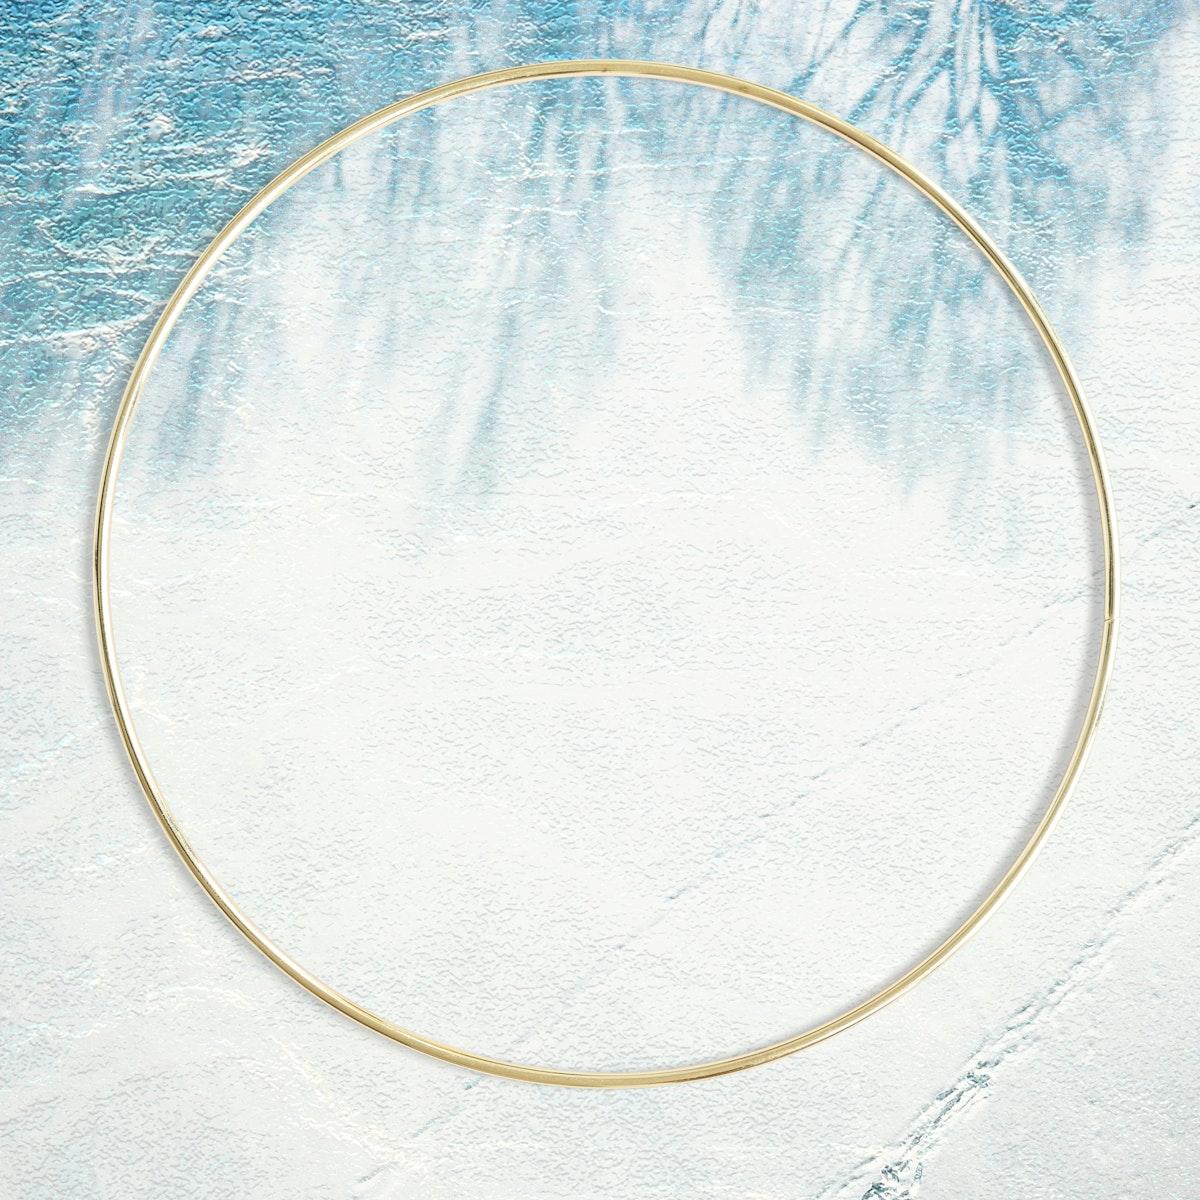 Golden round frame on a leafy shadow background